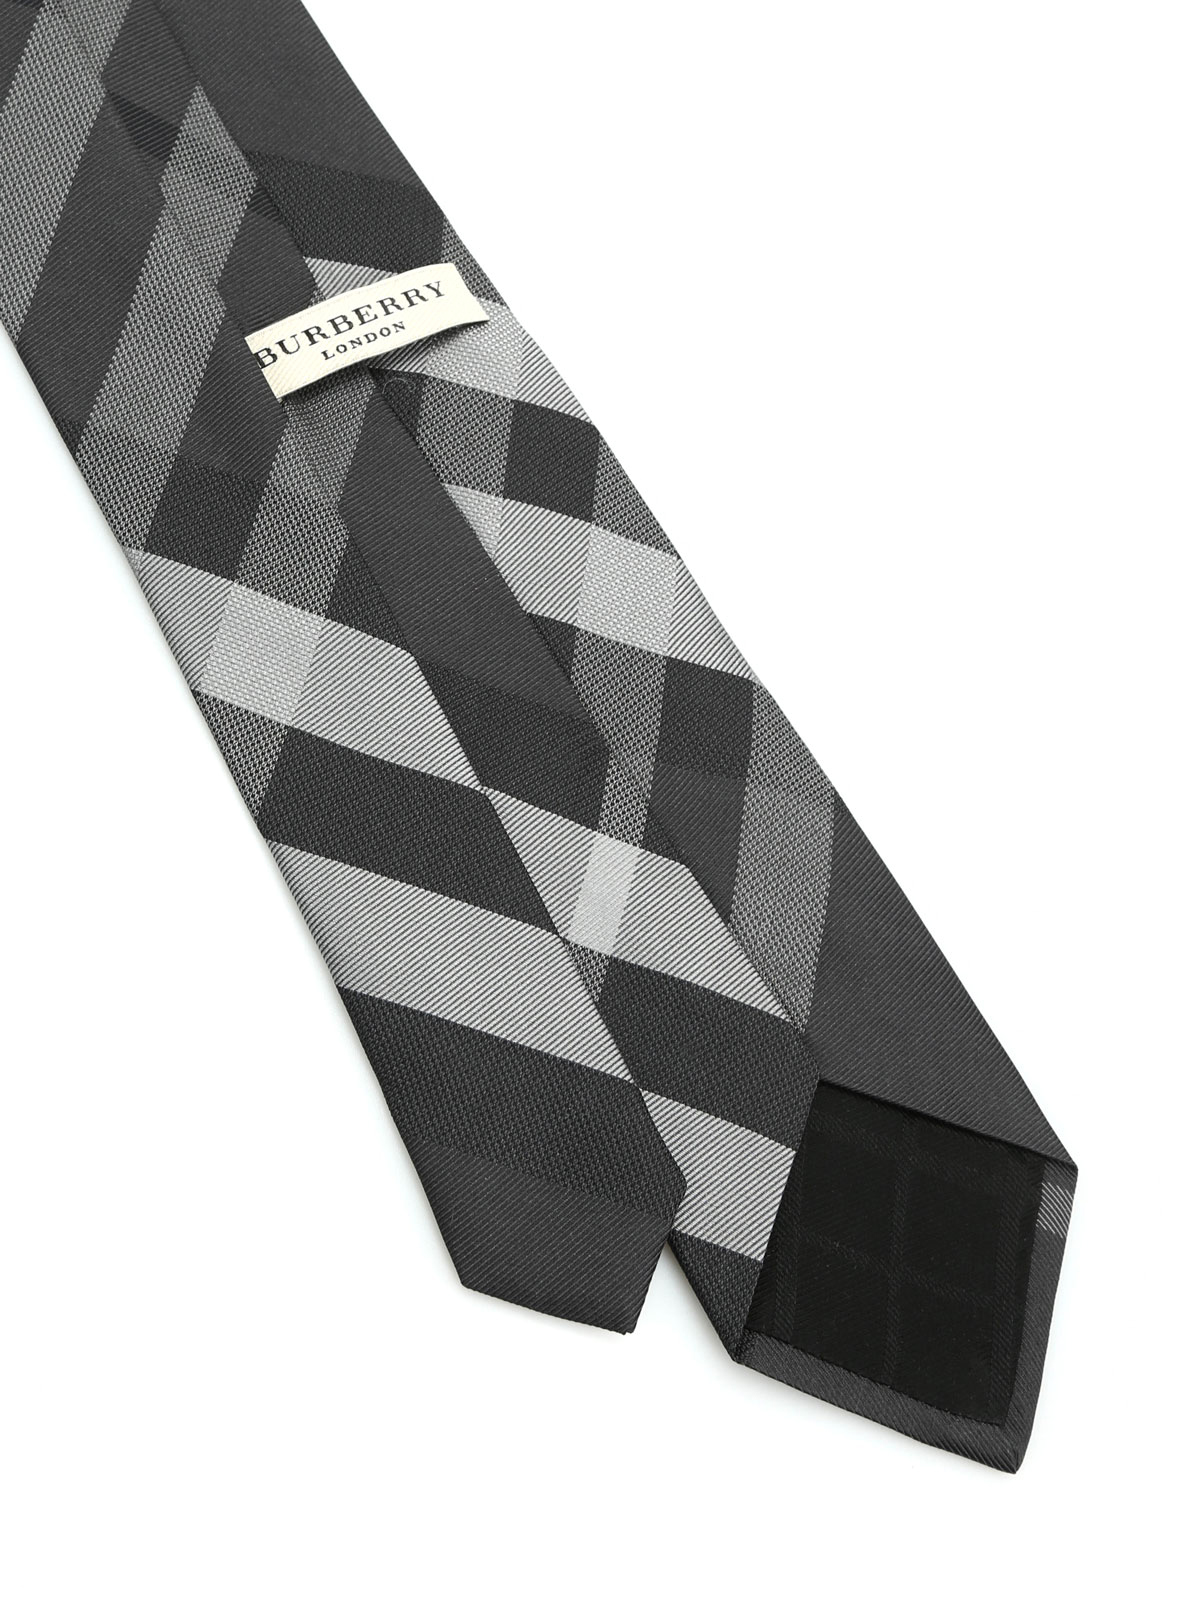 black burberry bow tie